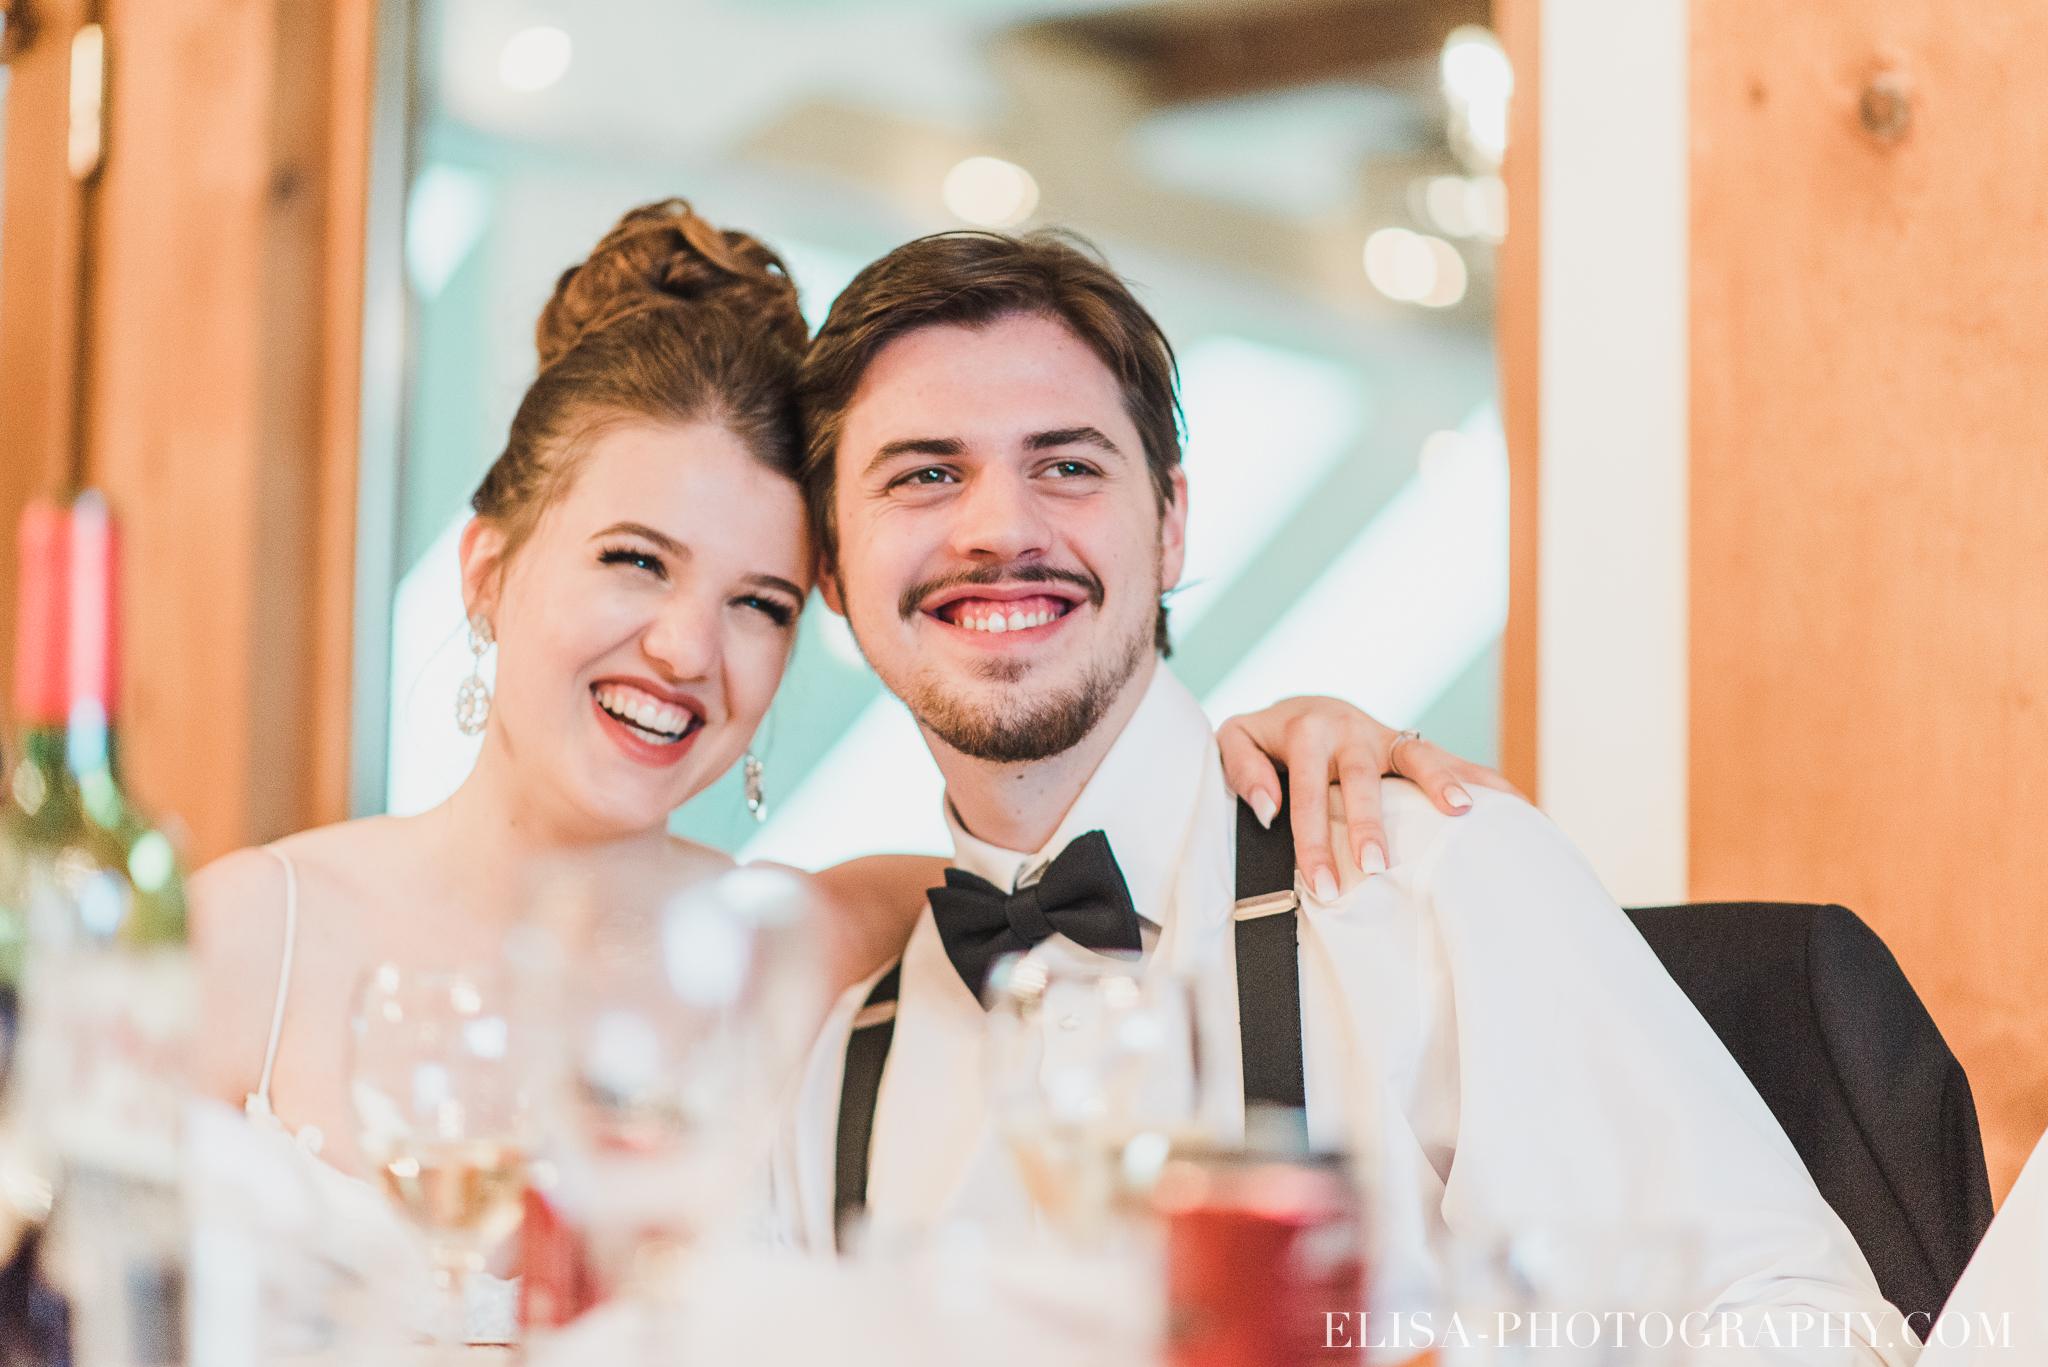 photo mariage a la montagne domaine tomali maniatin reception lifestyle 6866 - Mariage à la montagne au domaine Tomali-Maniatyn